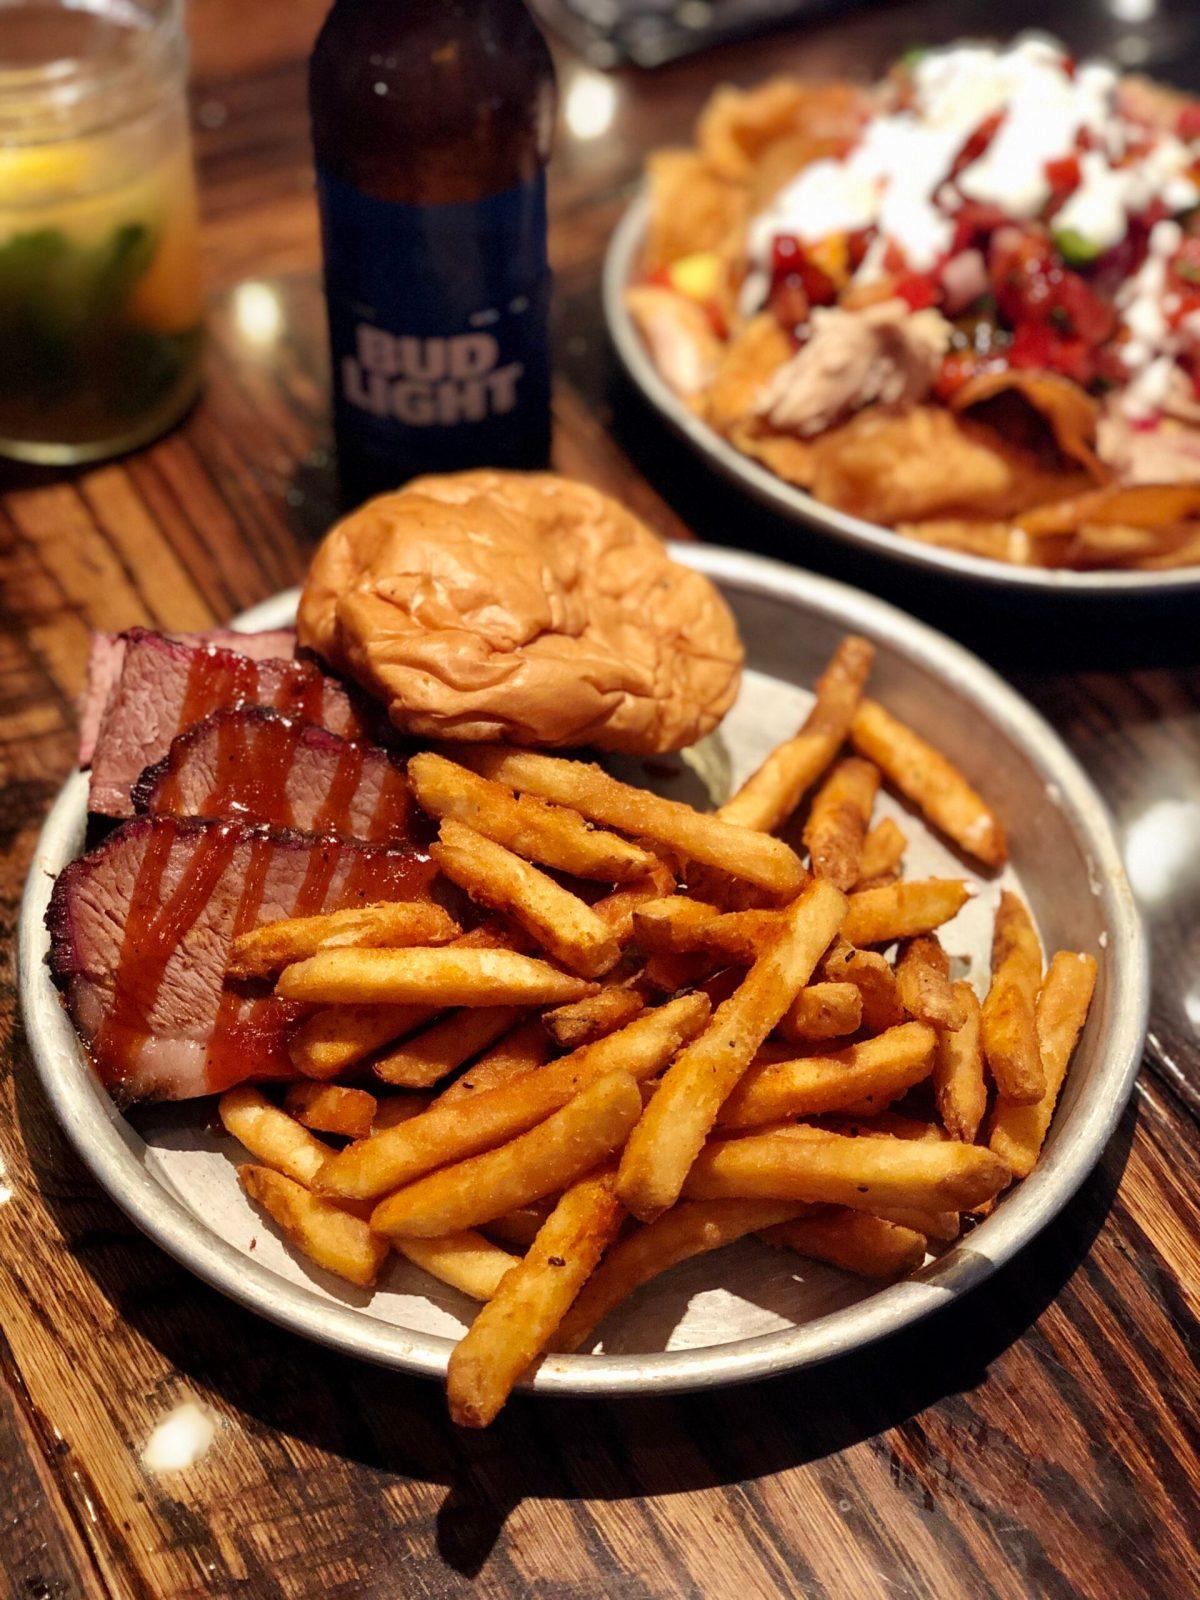 Beef Brisket Sandwich at Edley's Bar-B-Que #nashville #nashvillefood #instagramnashville #bestbbqnashville #nashvillebbq